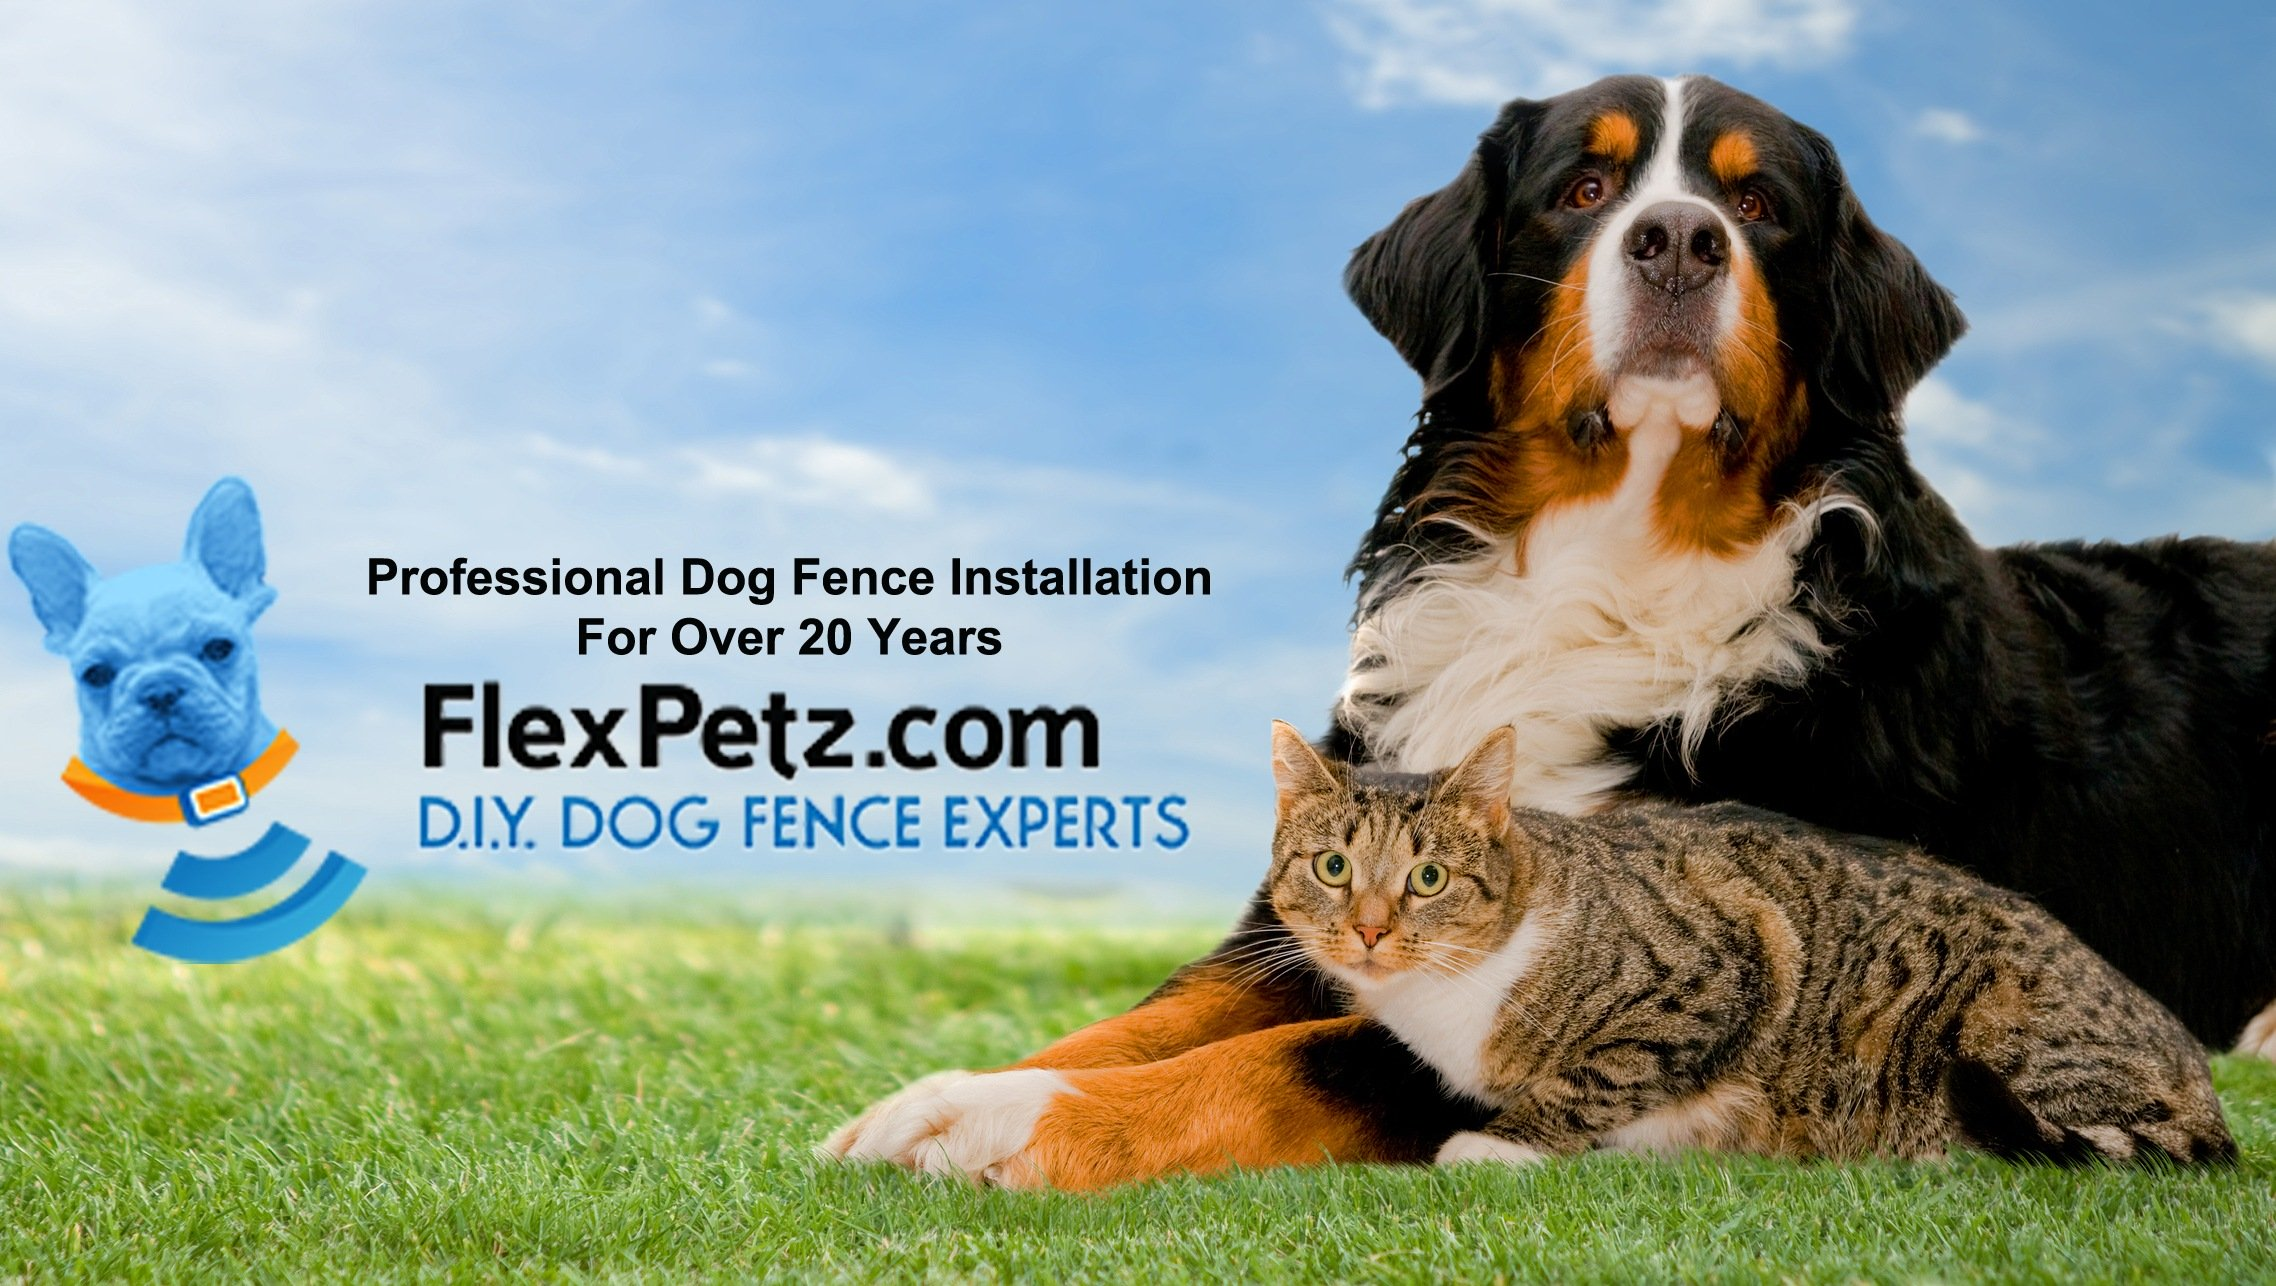 Flextpetz DIY Dog Fence Specialists